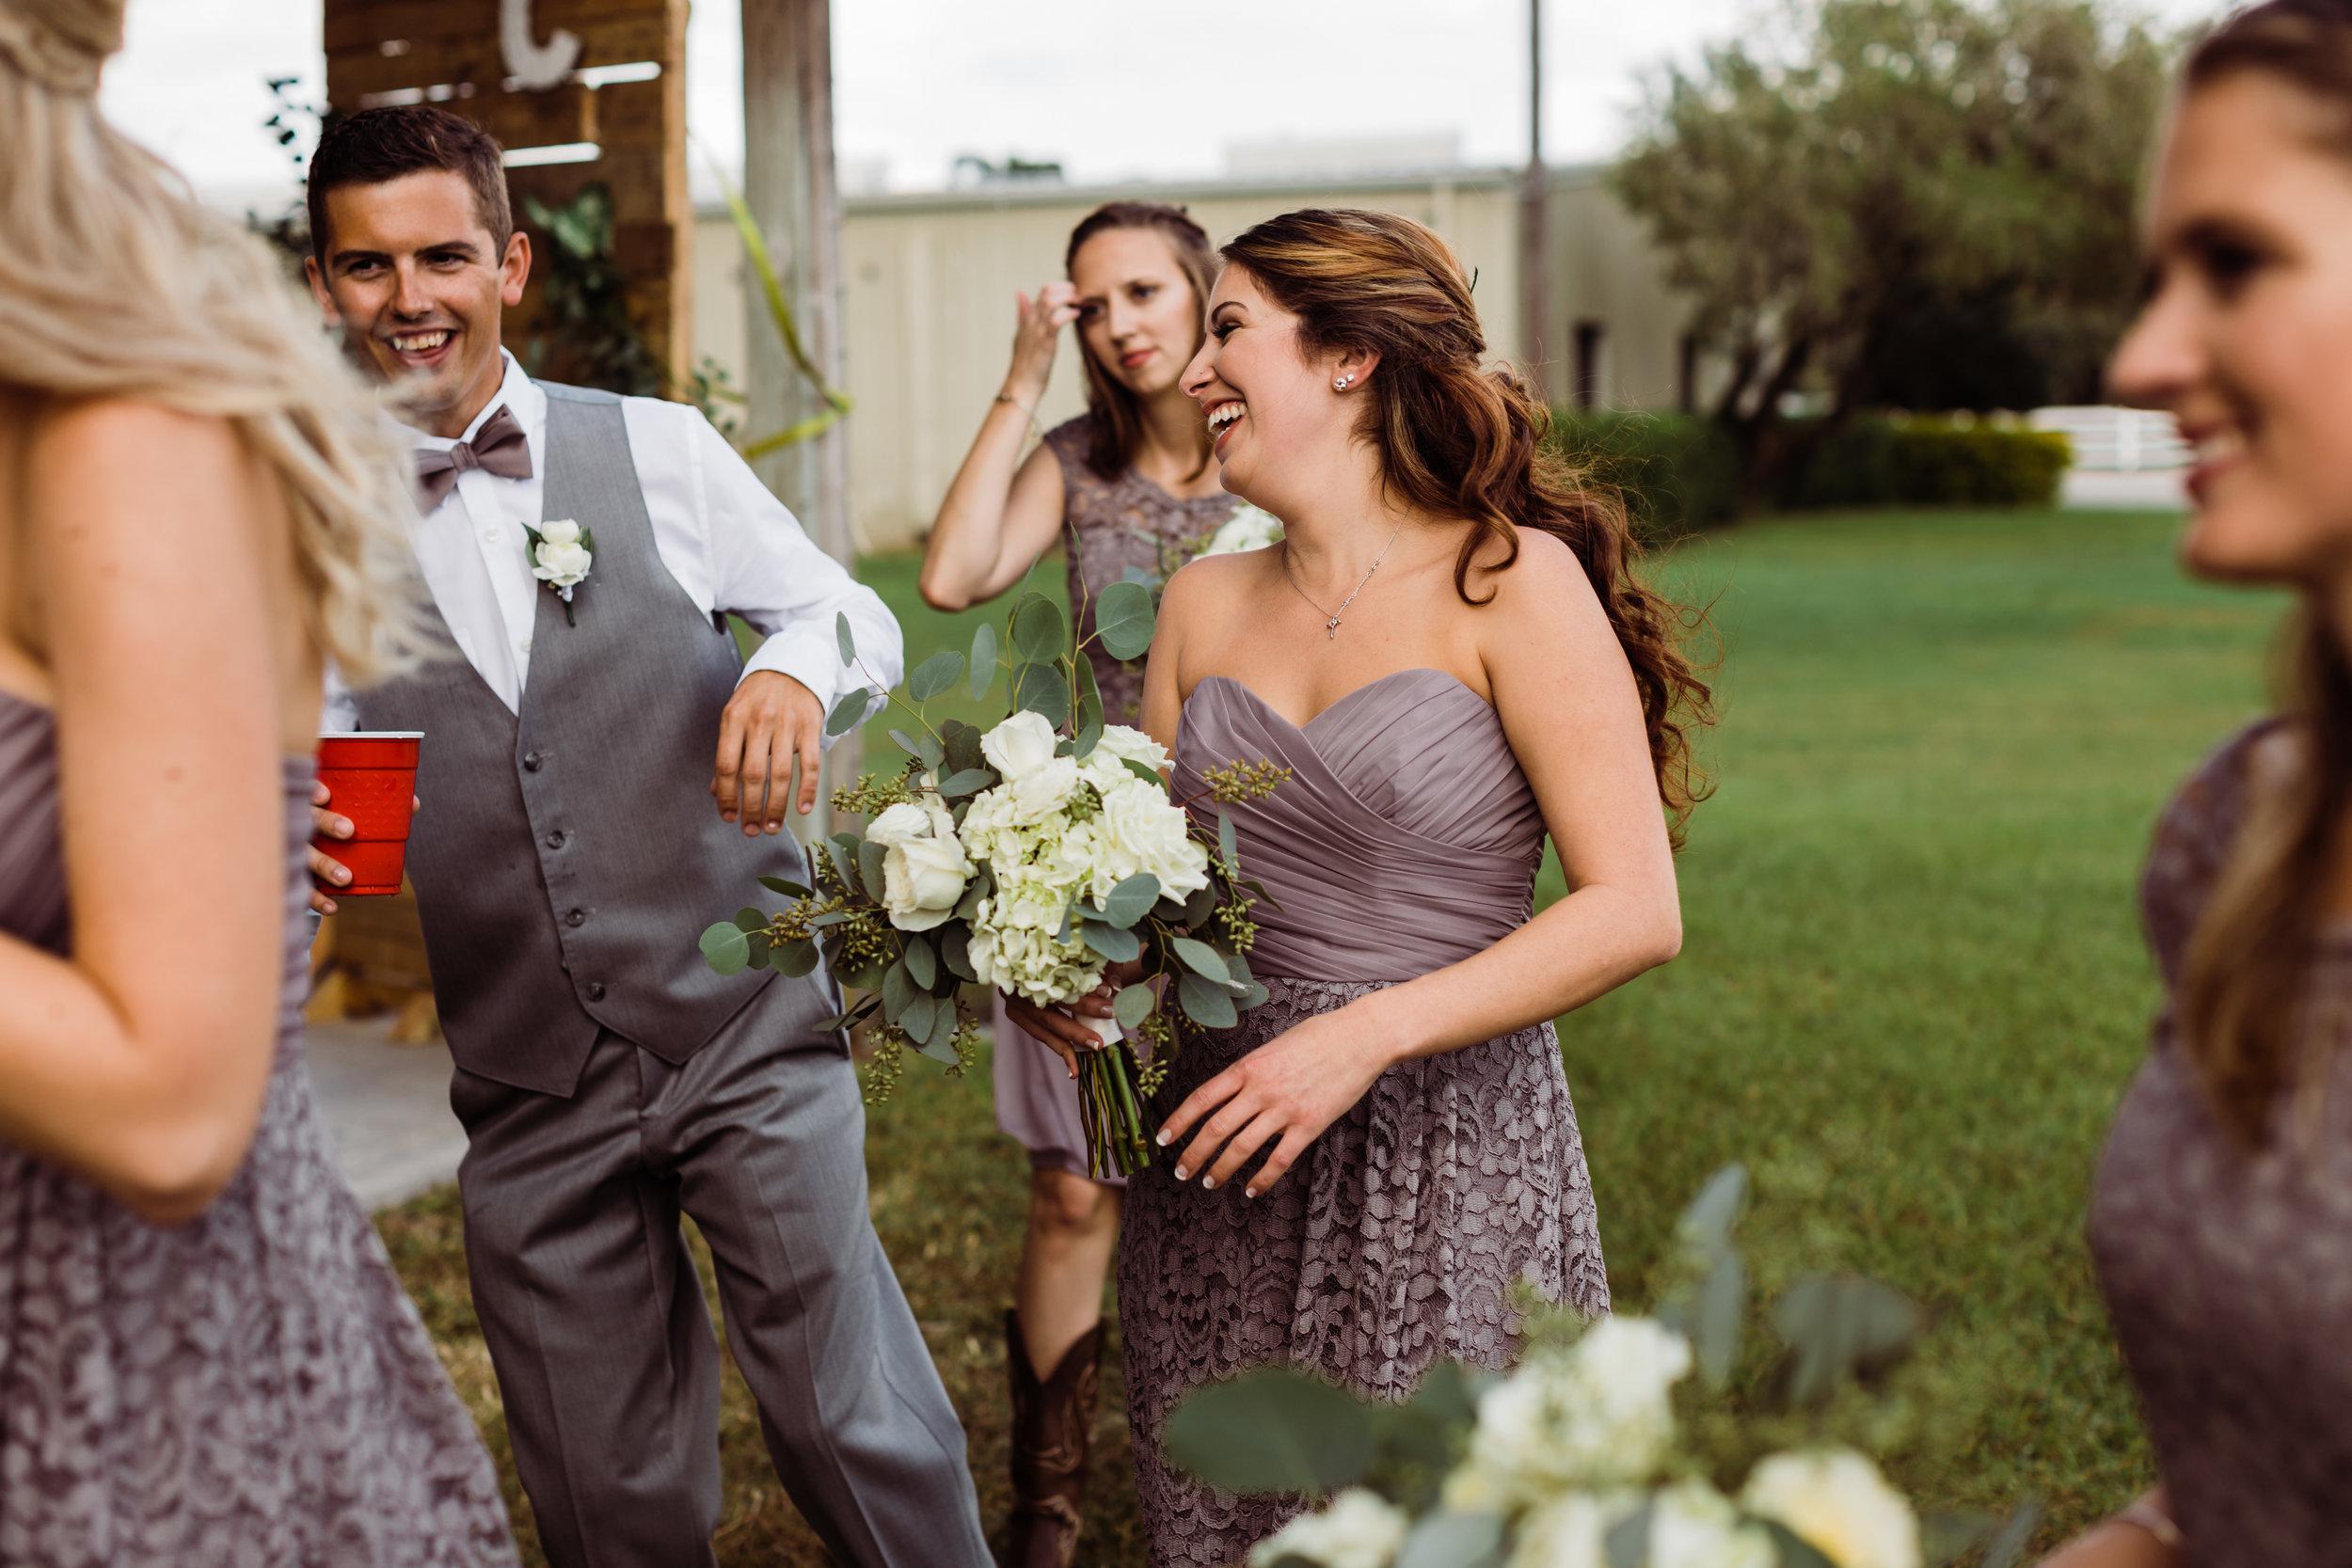 2017.10.14 Samantha and Matthew Crabtree Sarasota Wedding (251 of 708).jpg